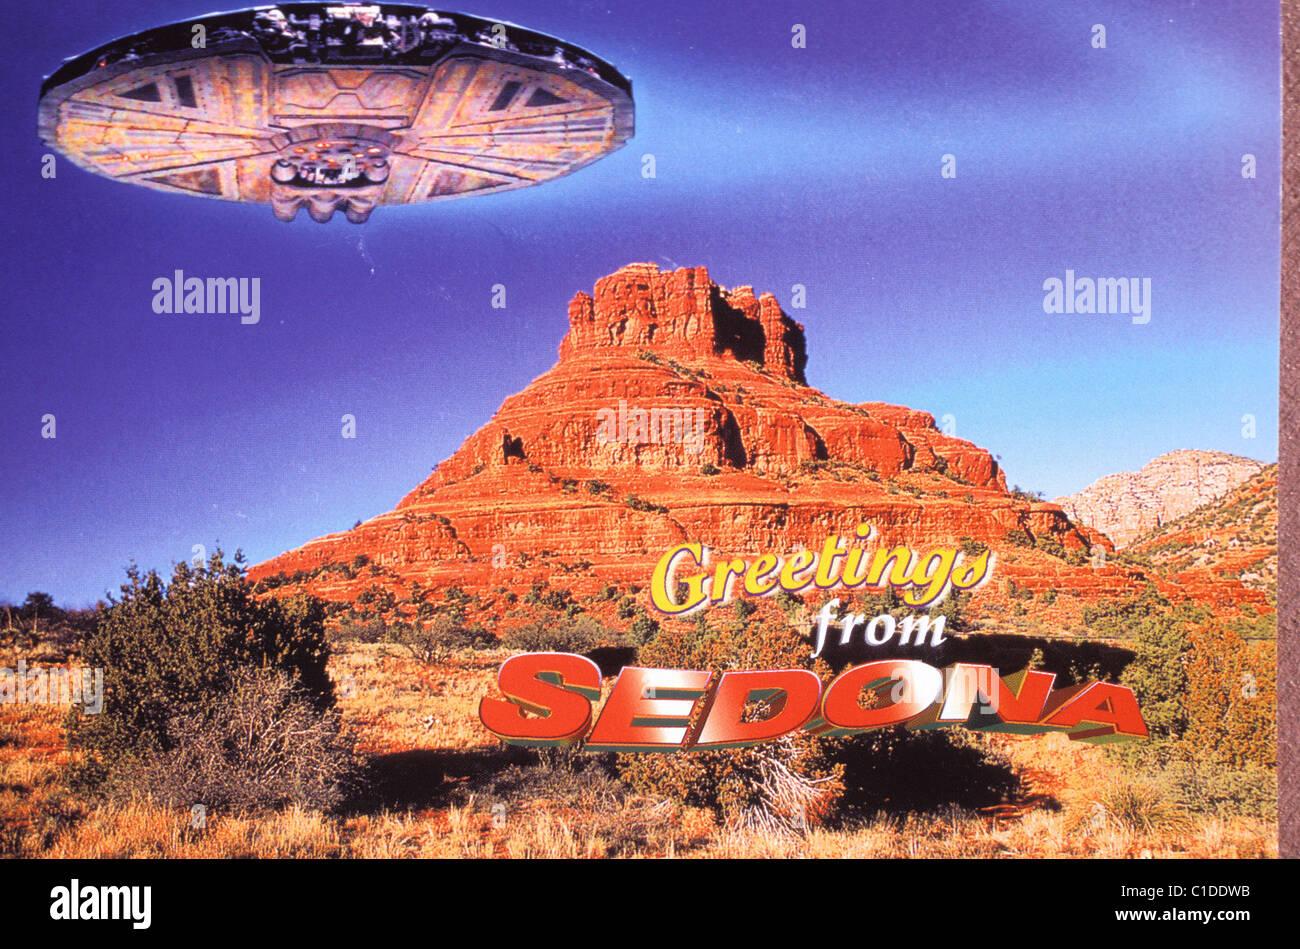 United States, Arizona, Sedona, New Age capital, UFO postcard - Stock Image